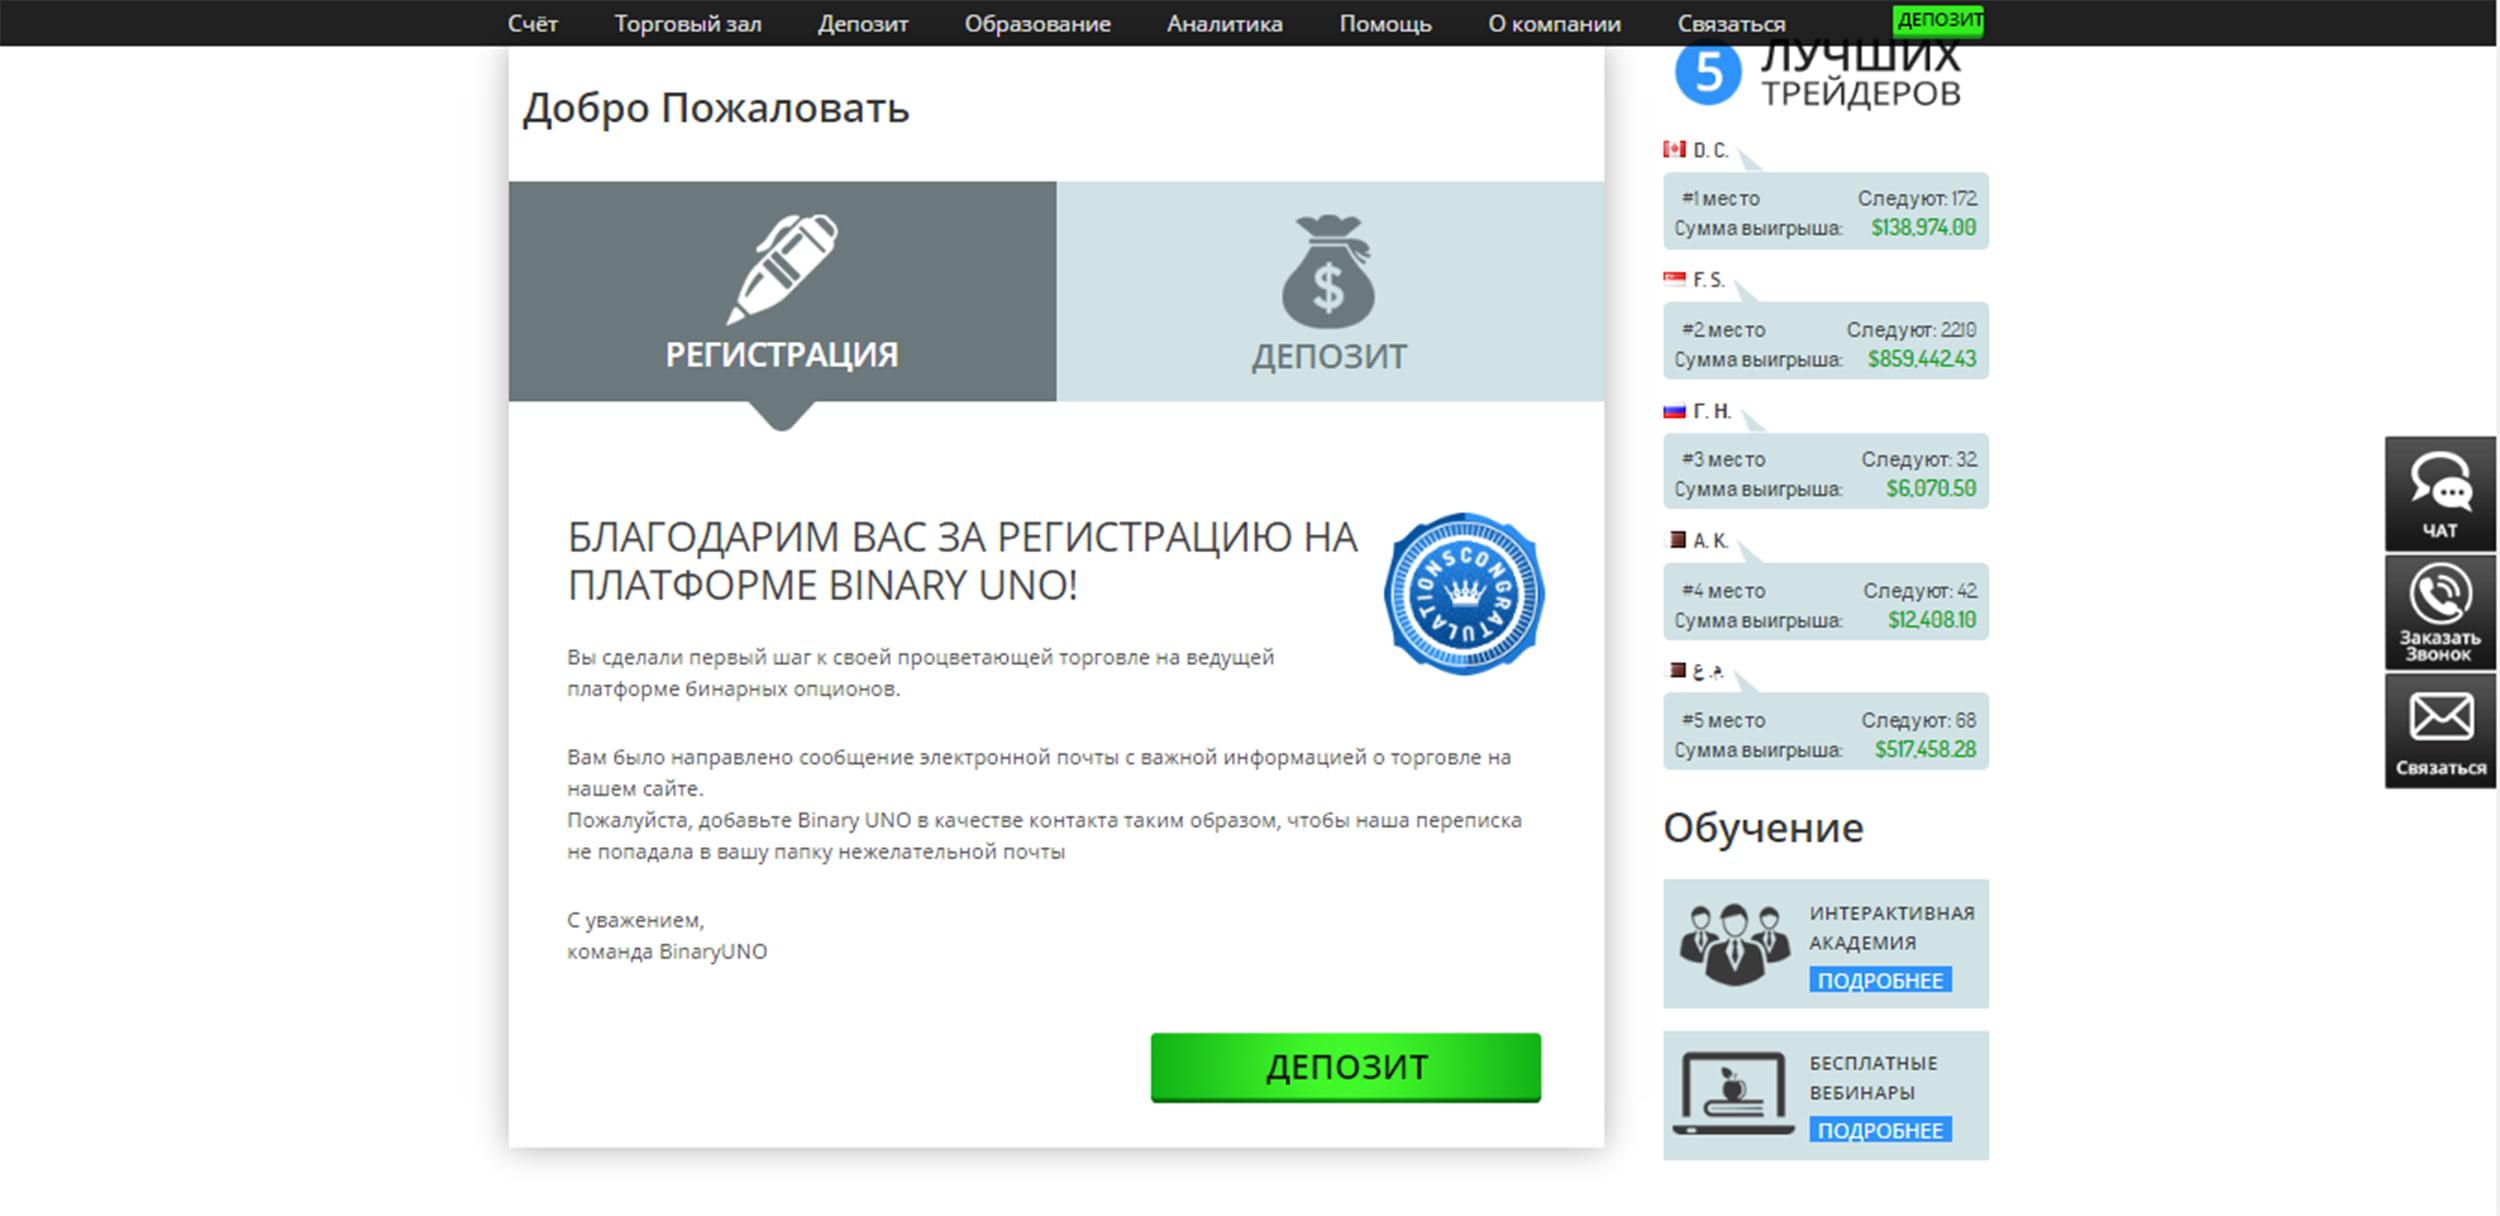 Заказ талонов врачу интернет волжский